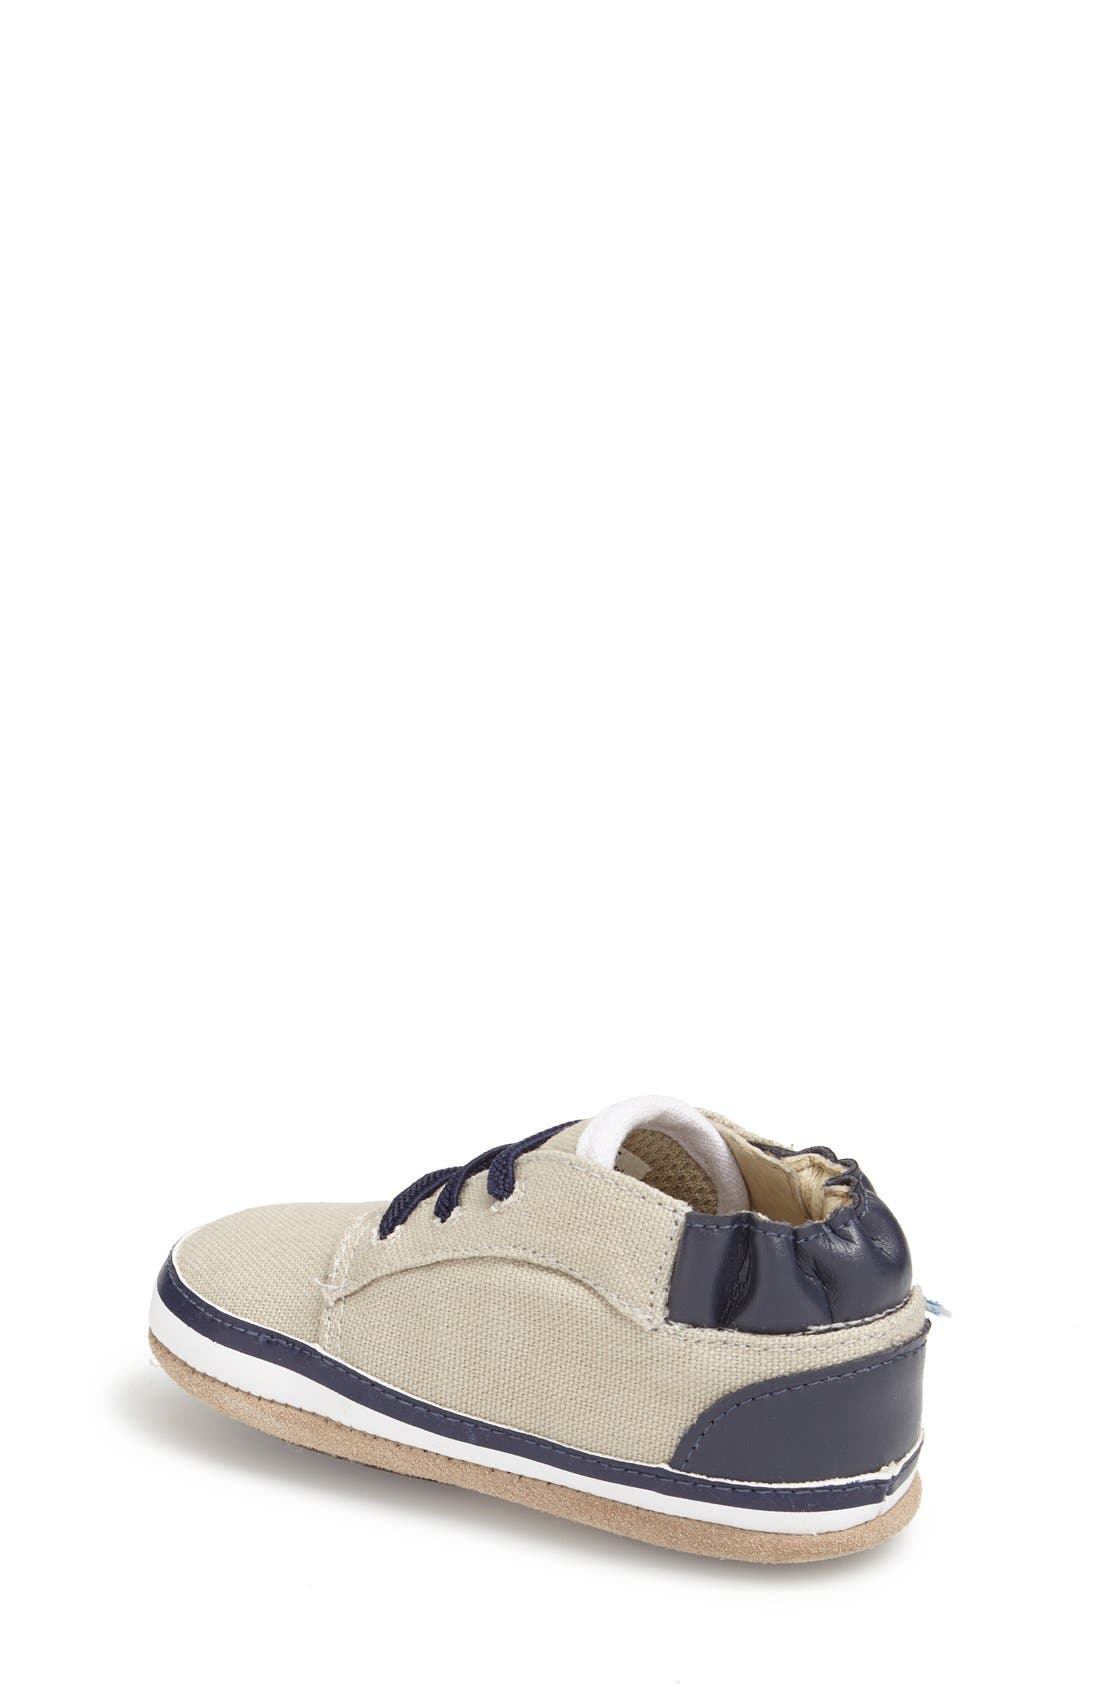 Alternate Image 2  - Robeez® 'Tyler Low Top' Crib Shoe (Baby)